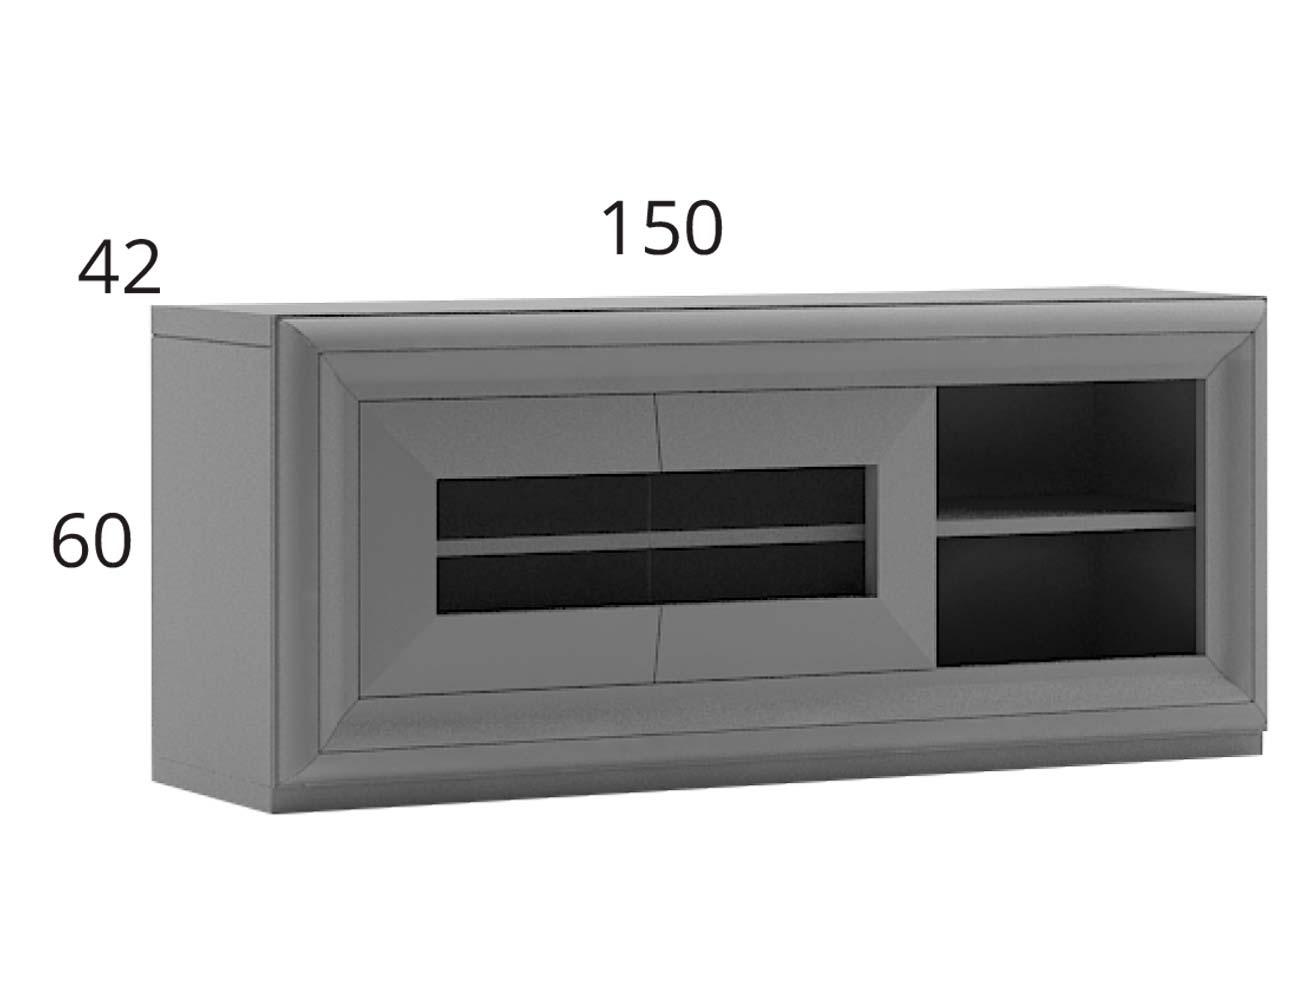 A0261